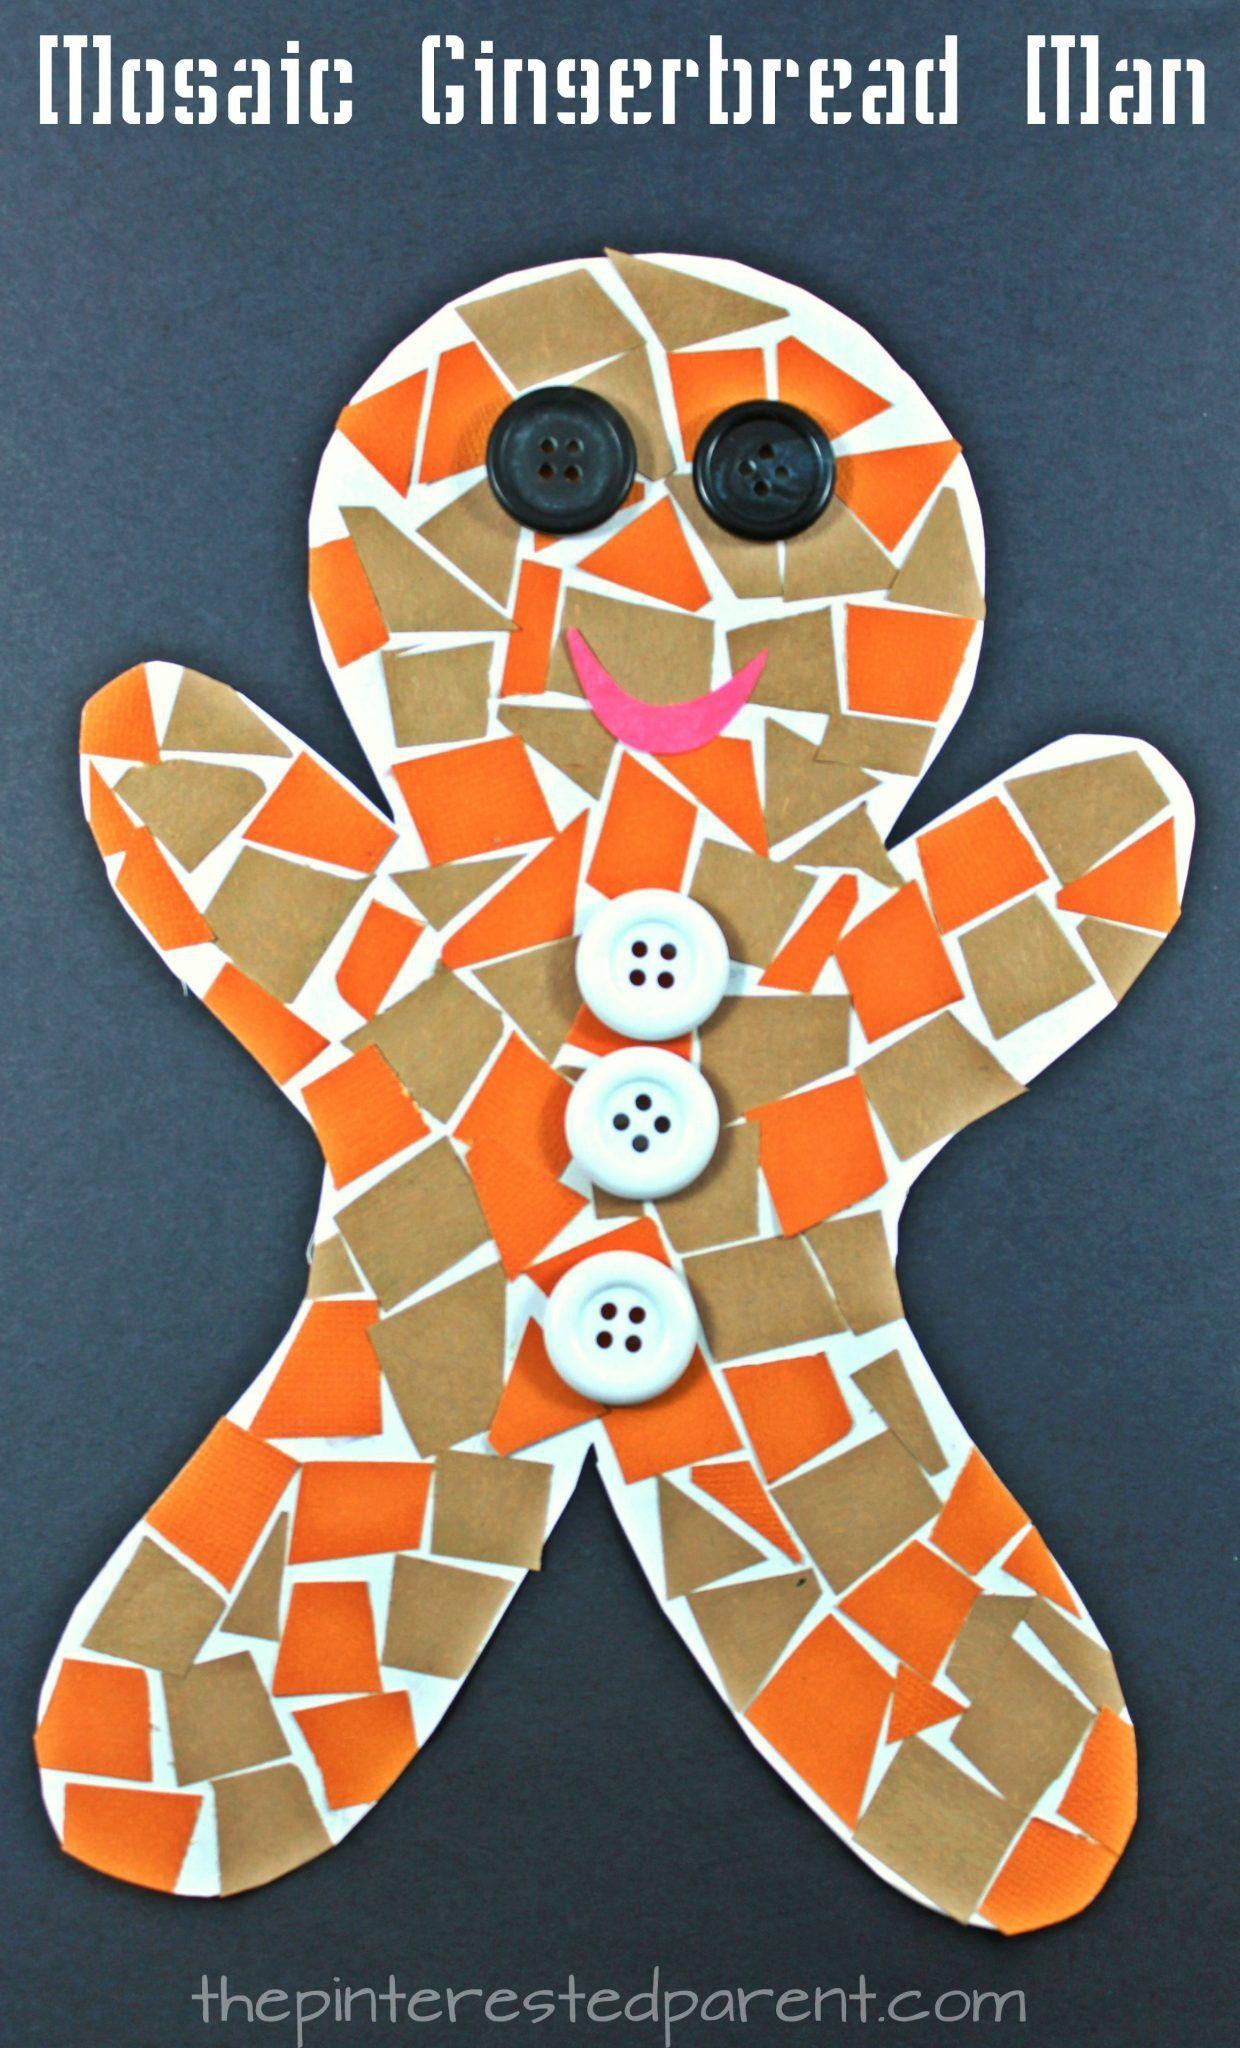 Construction Paper Gingerbread Man Mosaic